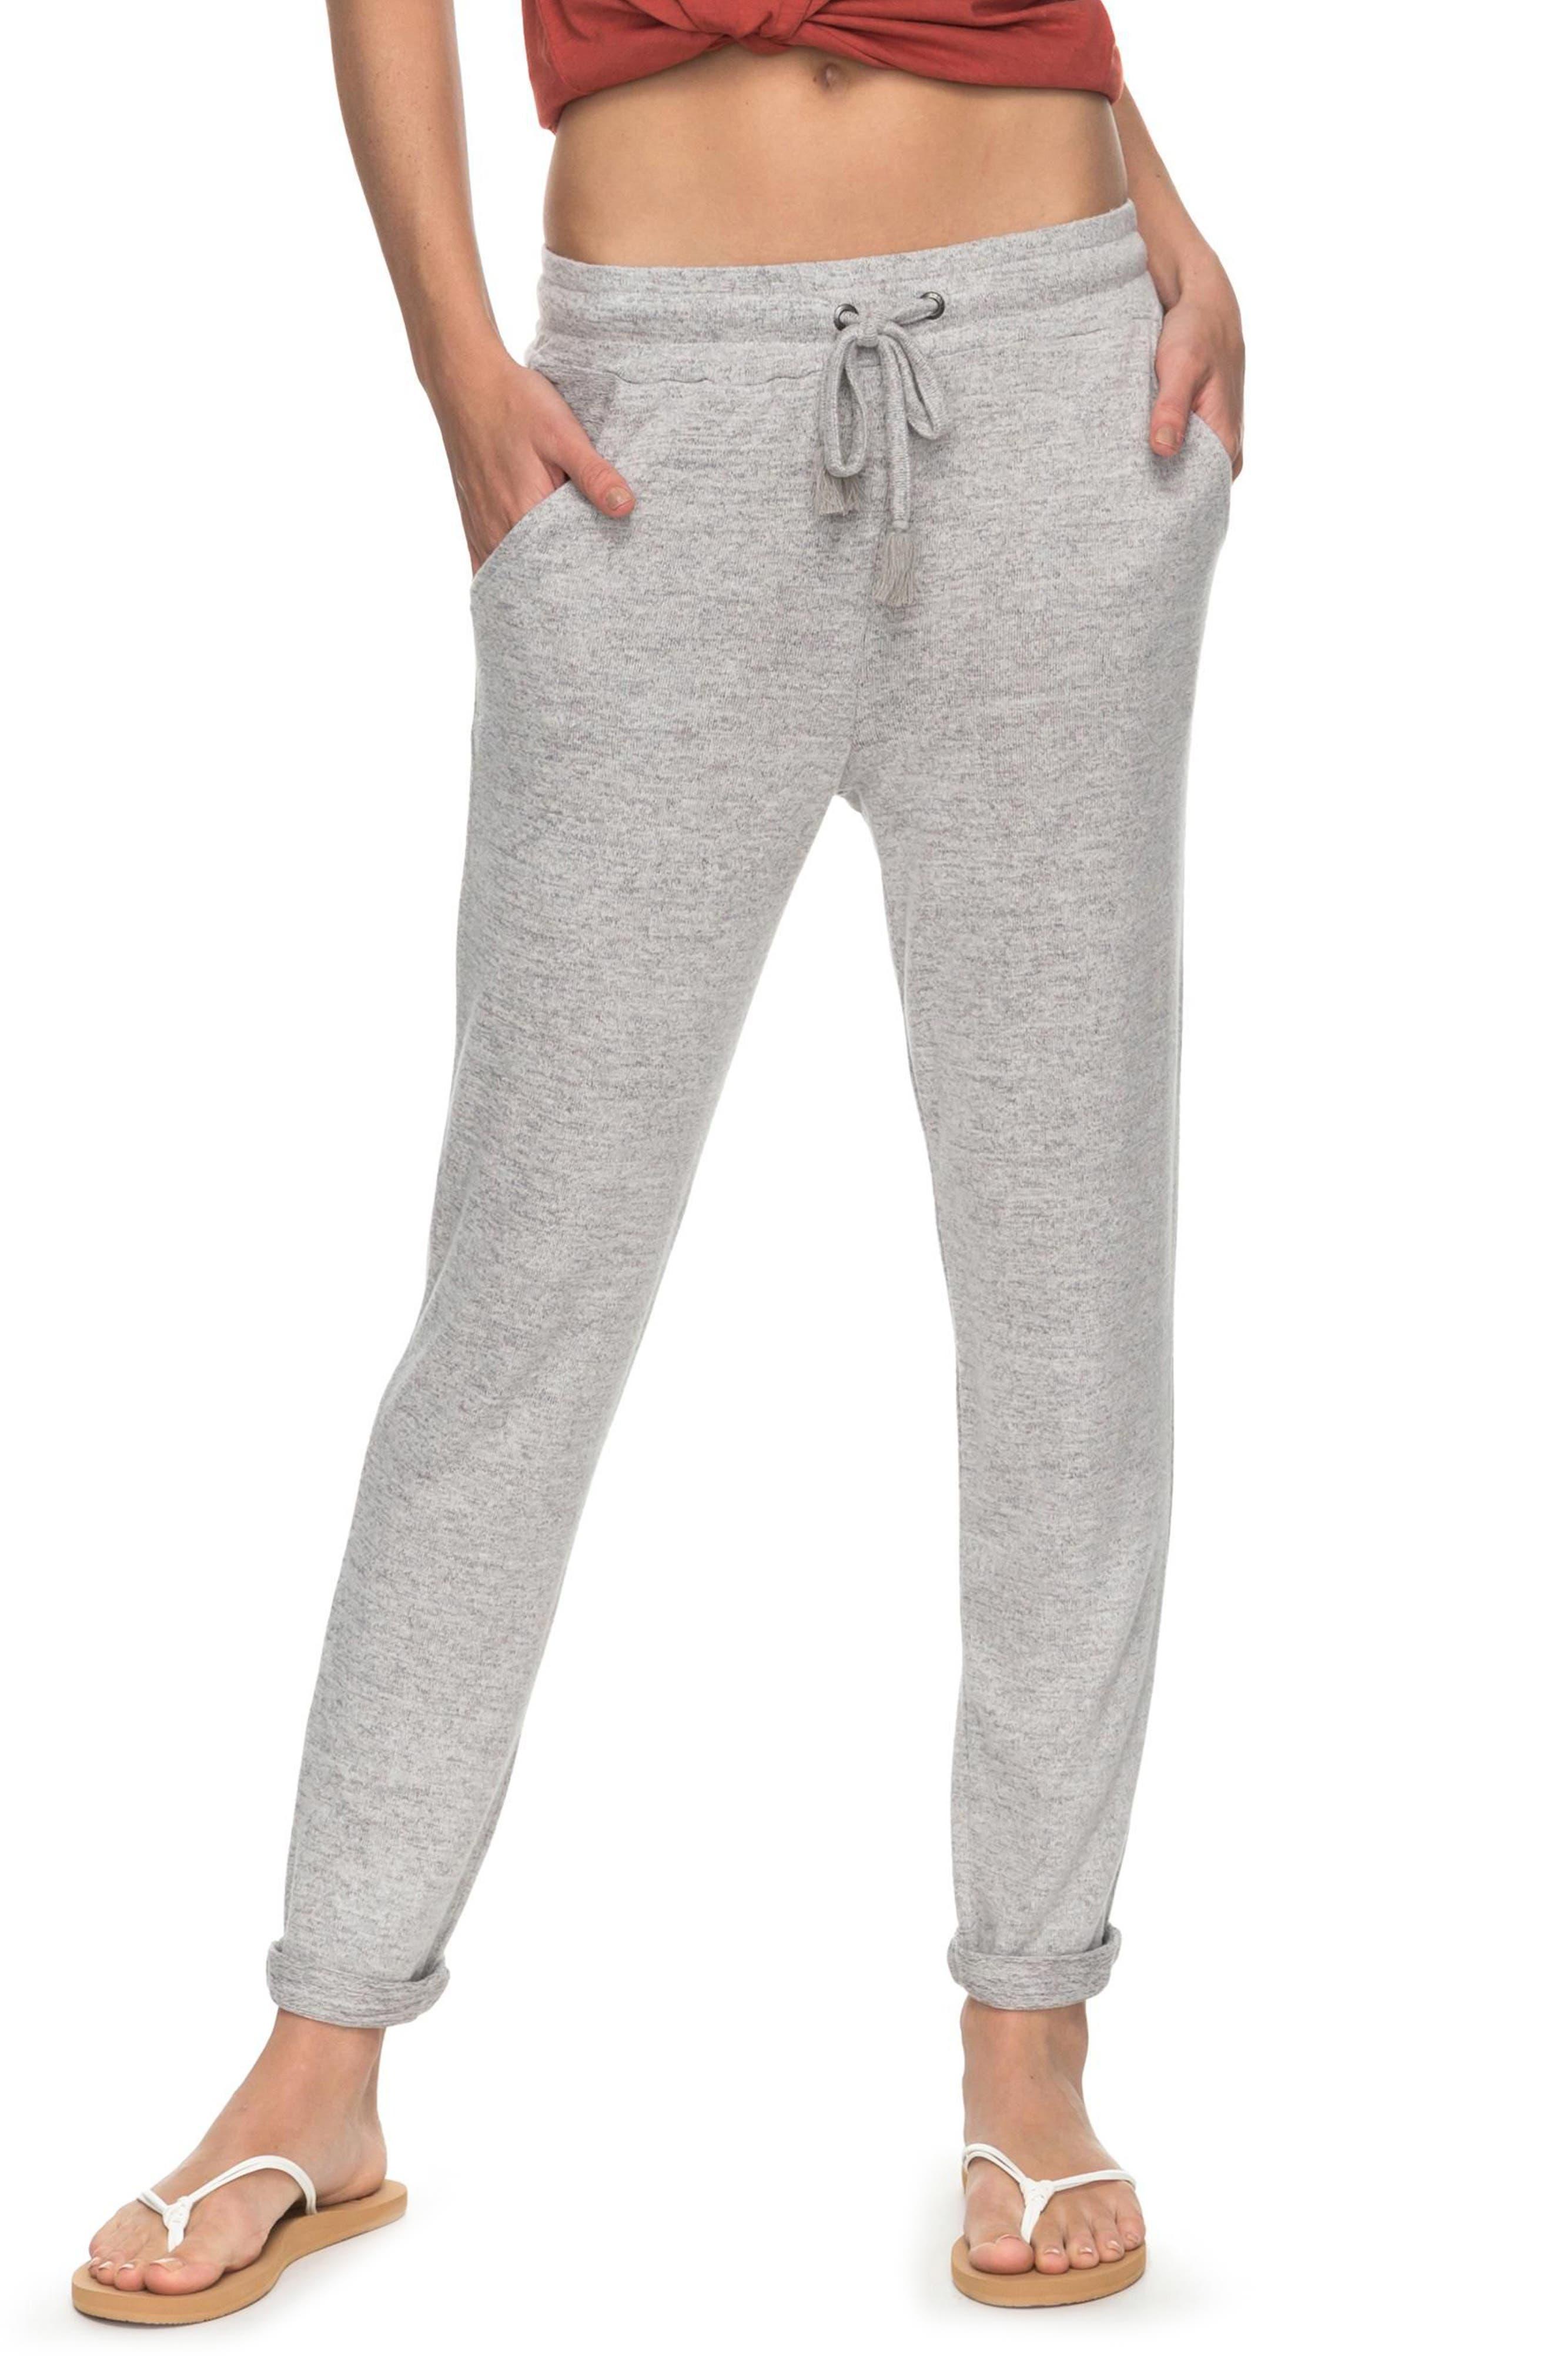 Roxy Cozy Chill Lounge Pants